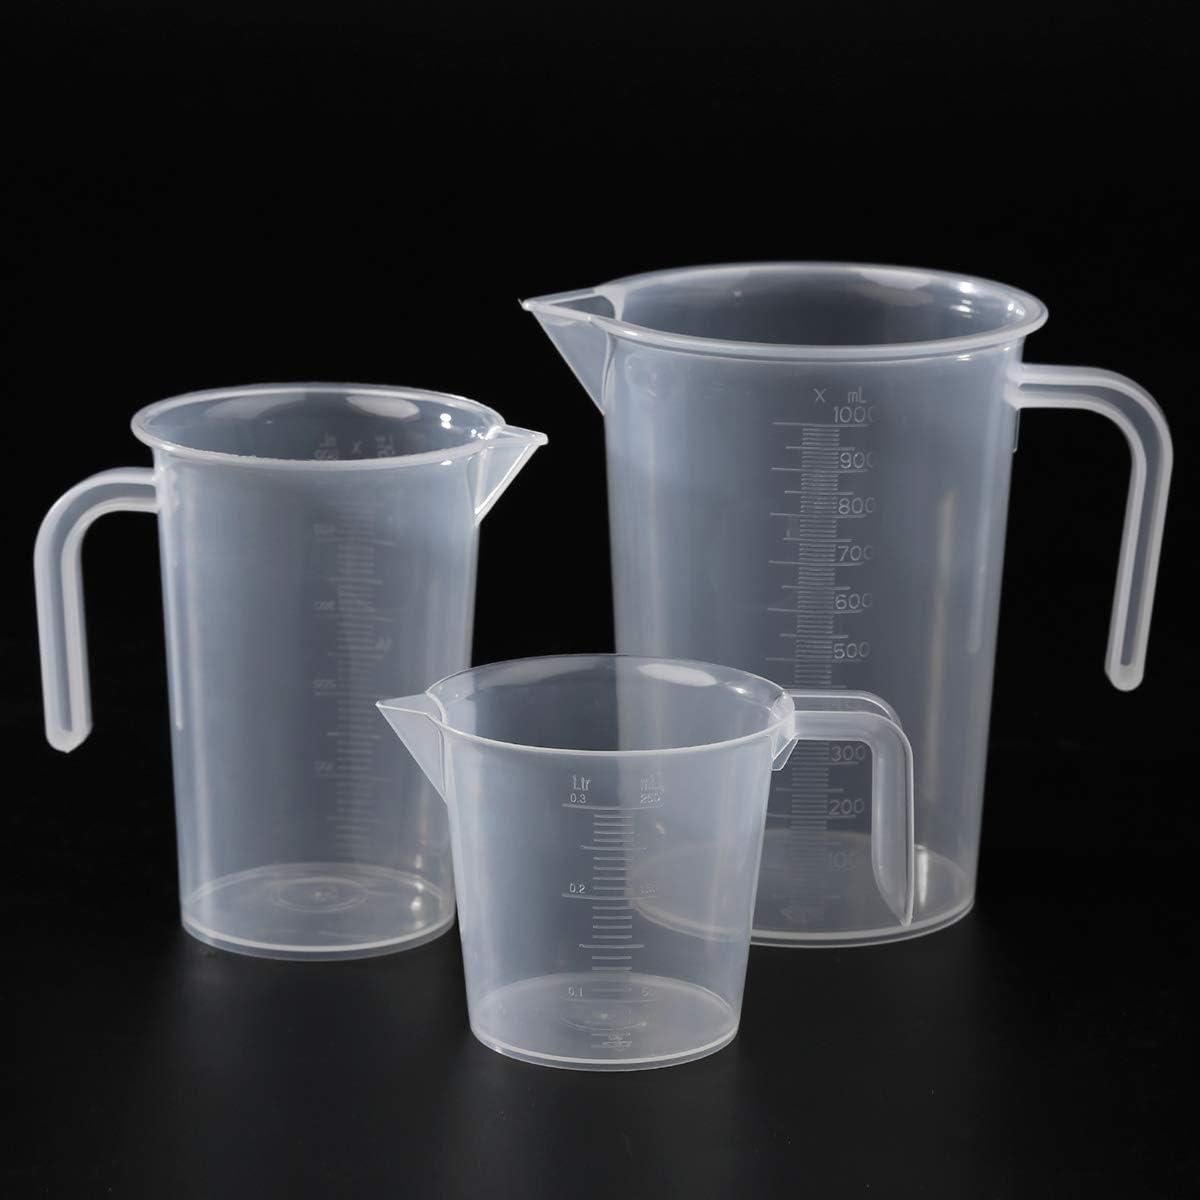 KitchenCraft Set of 3 Plastic Measuring Jugs